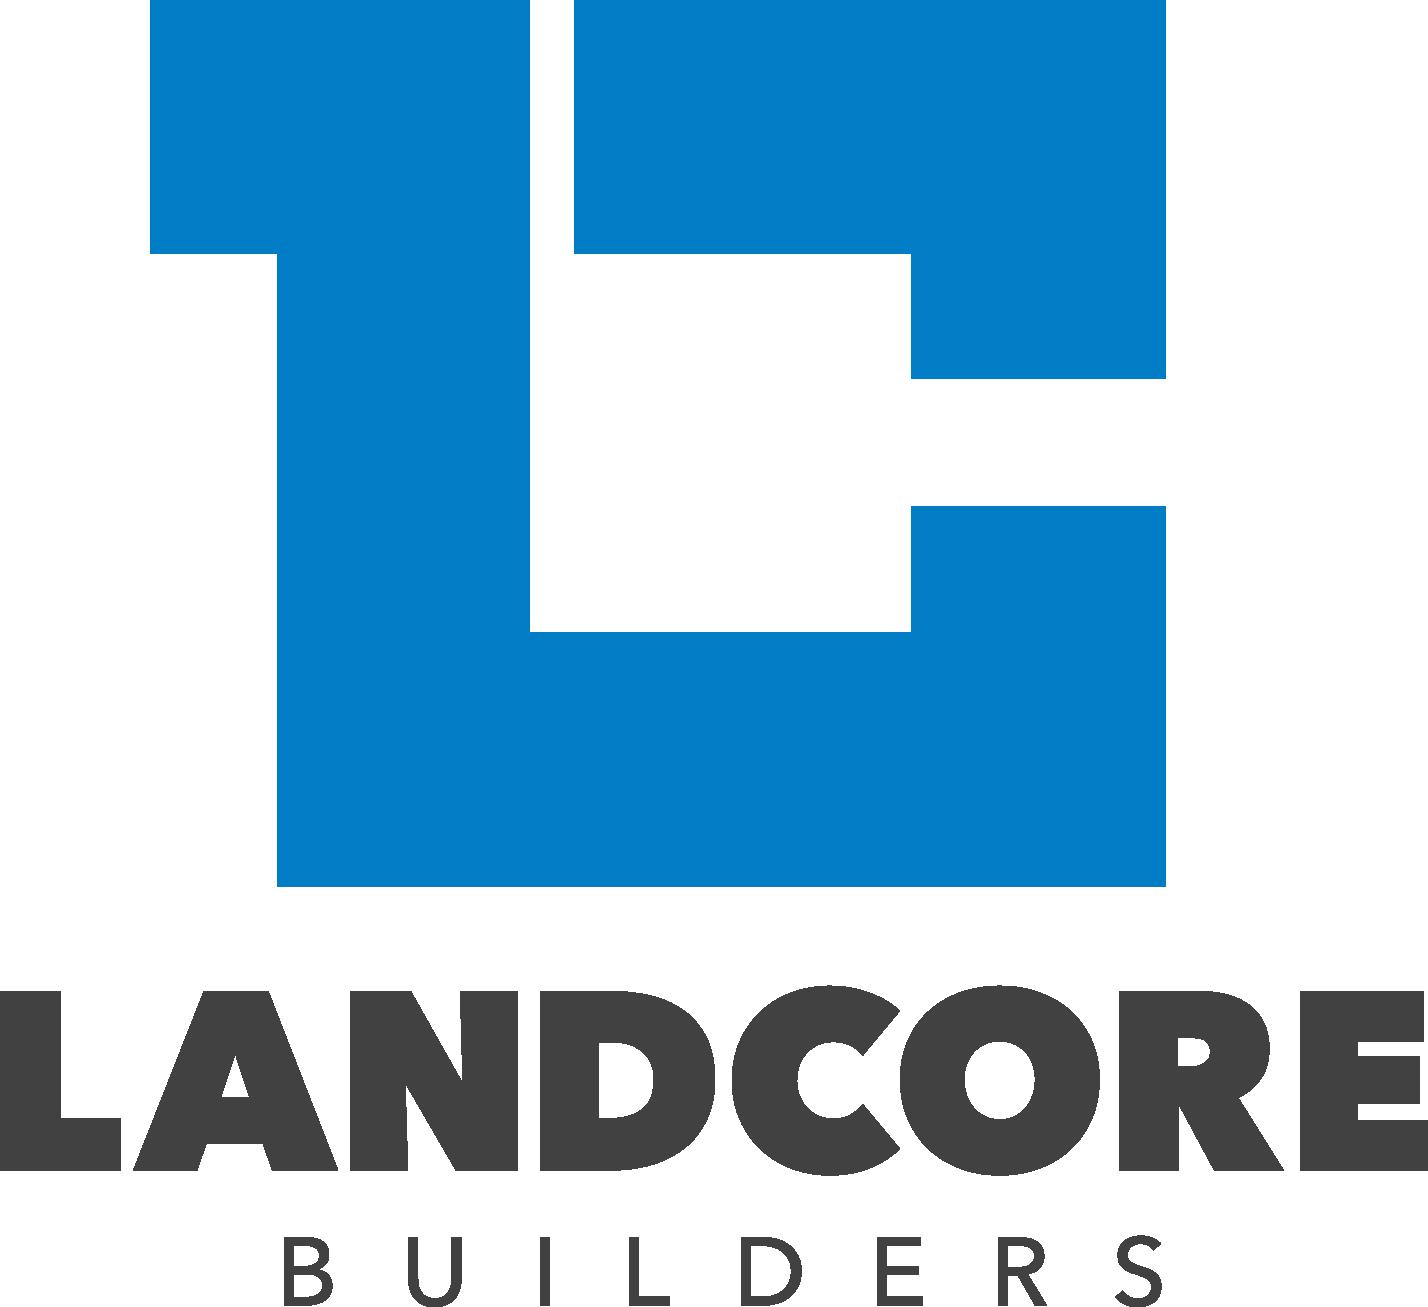 Landcore Builders-logo